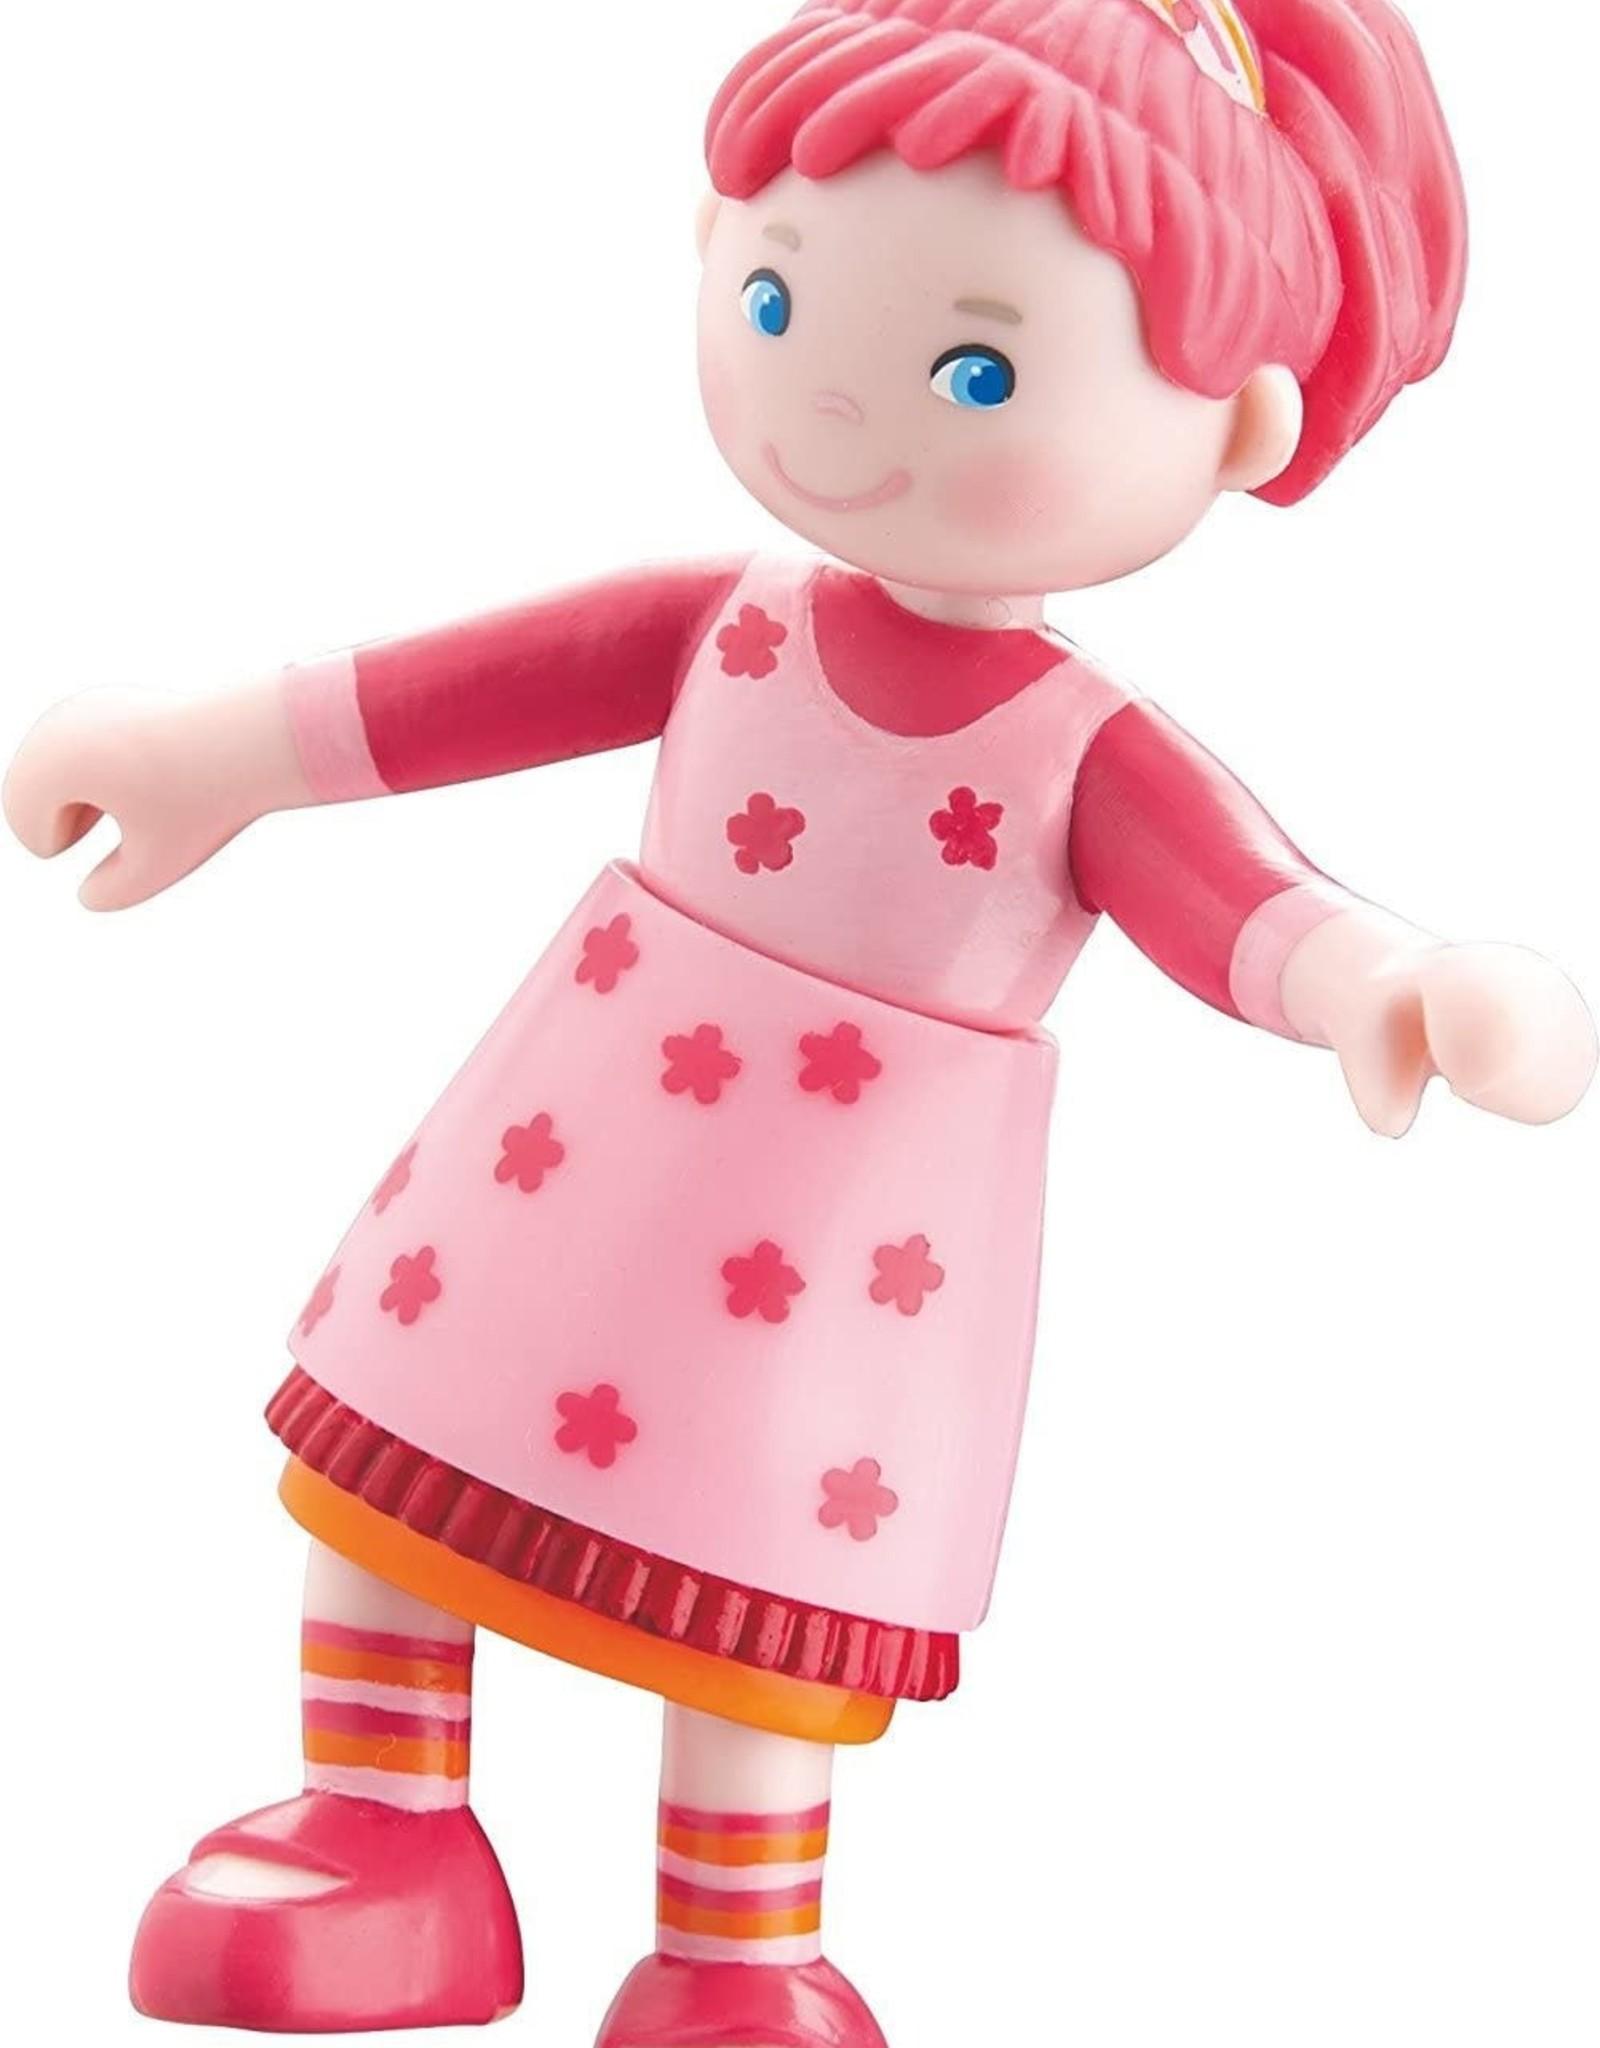 Haba LF Doll Lilli